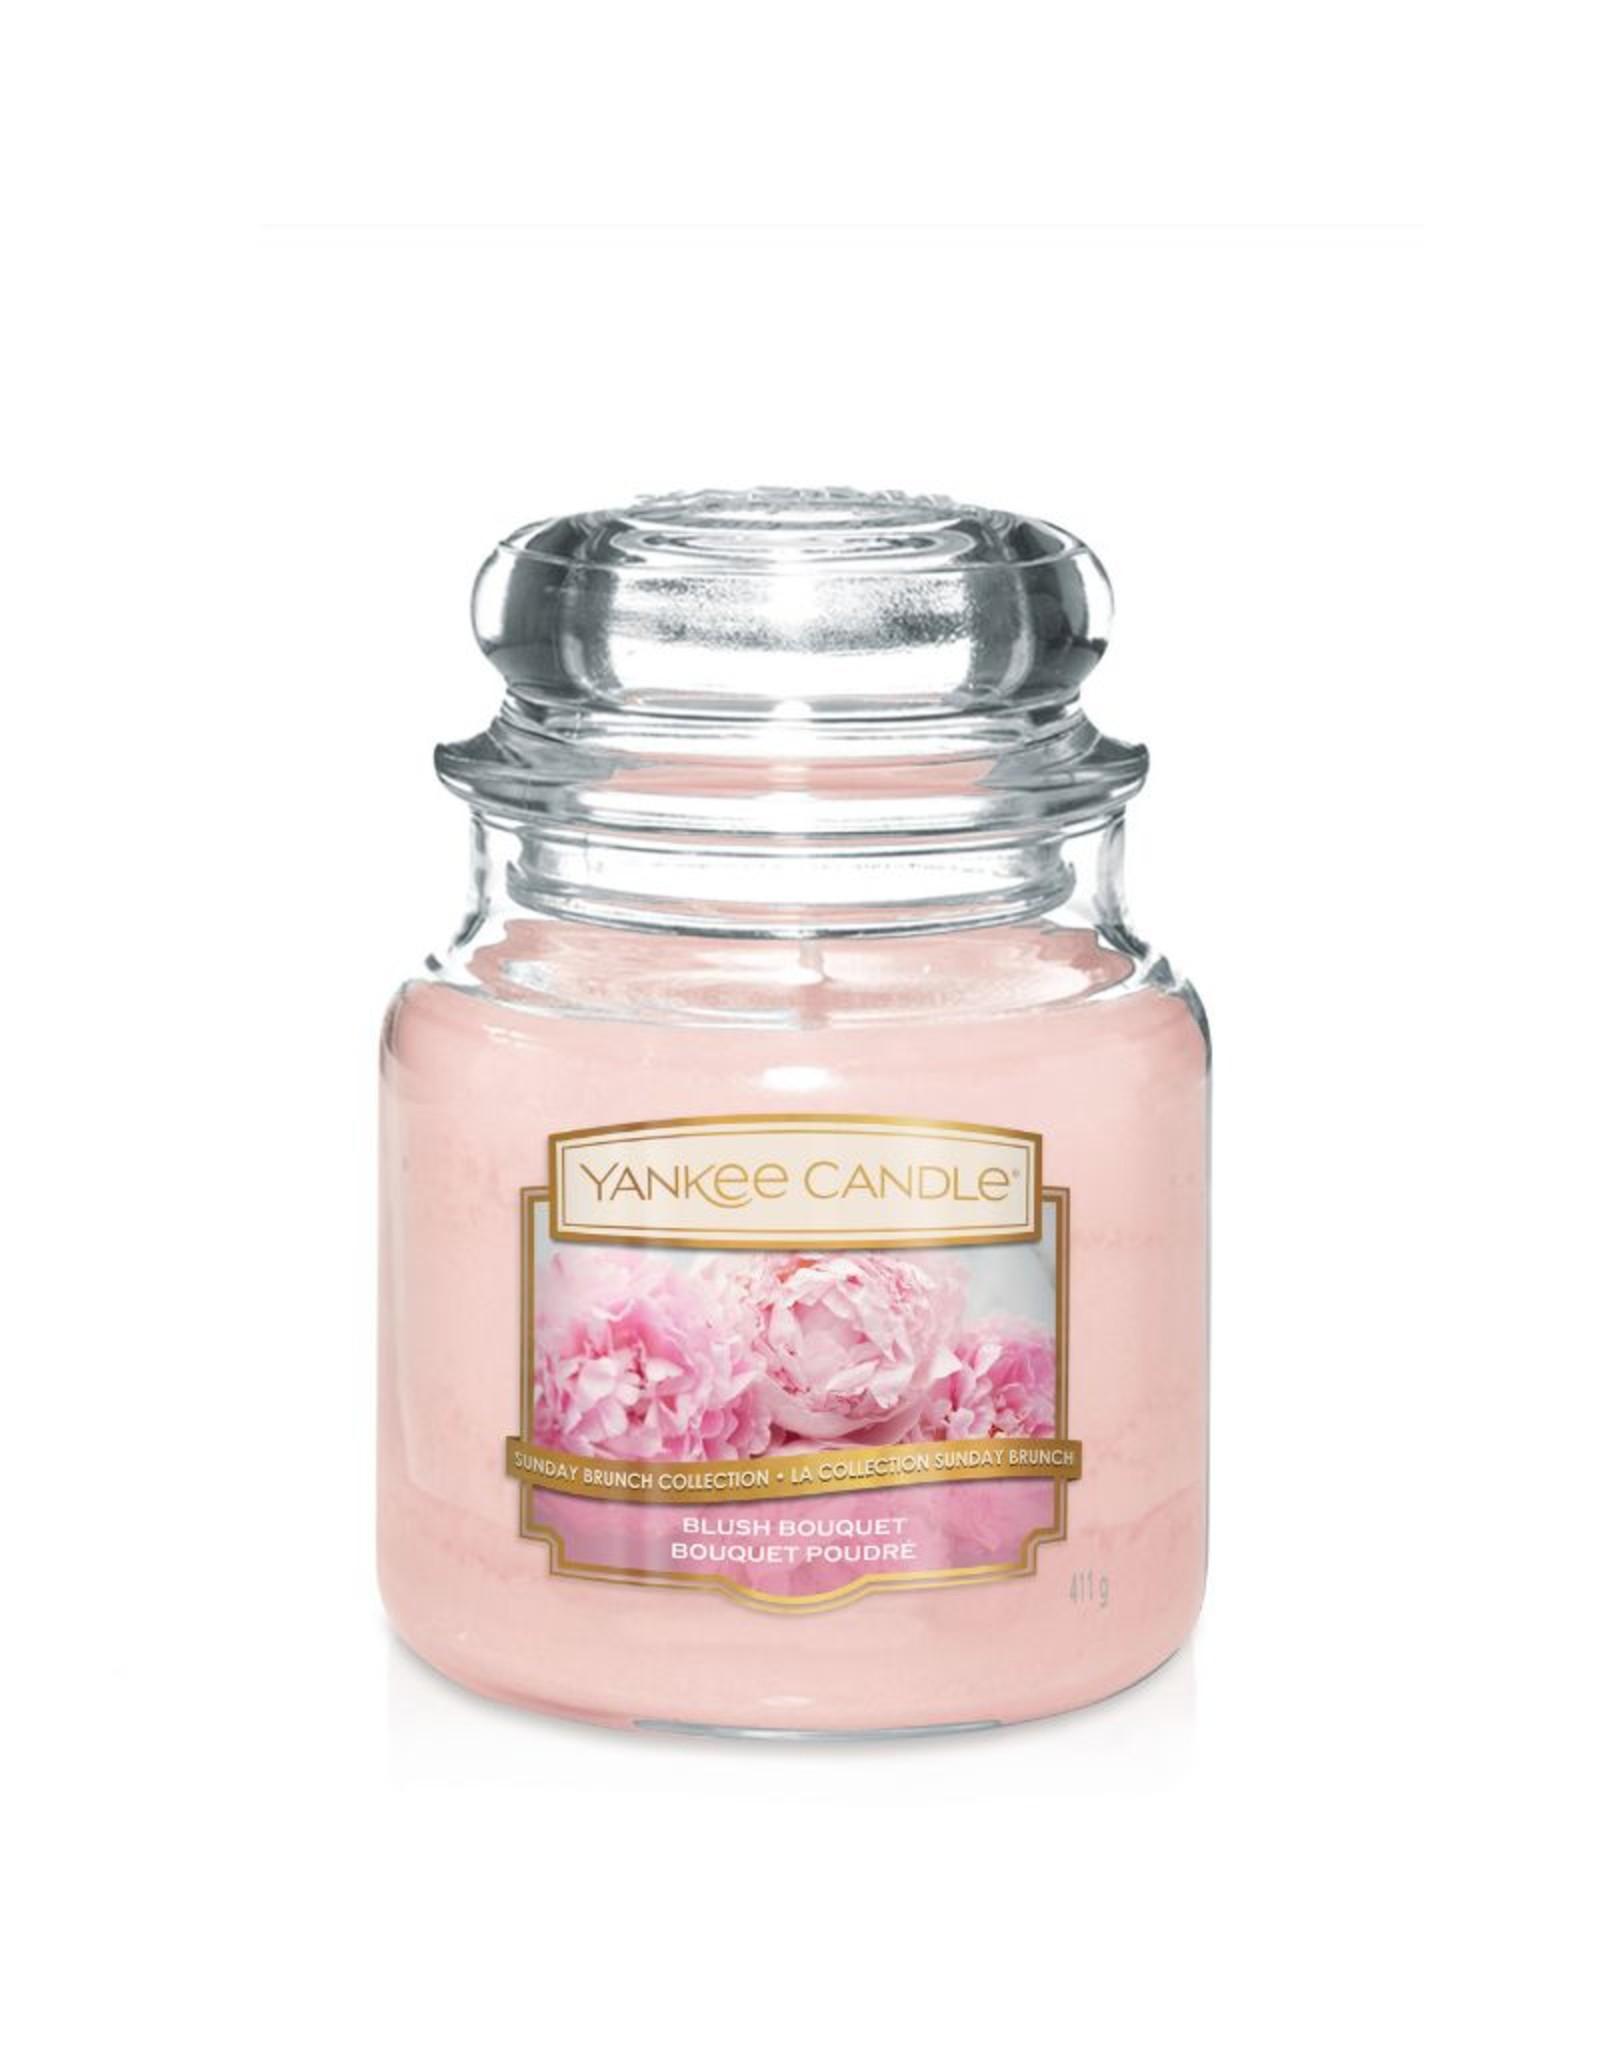 Yankee Candle Blush Bouquet - Medium jar